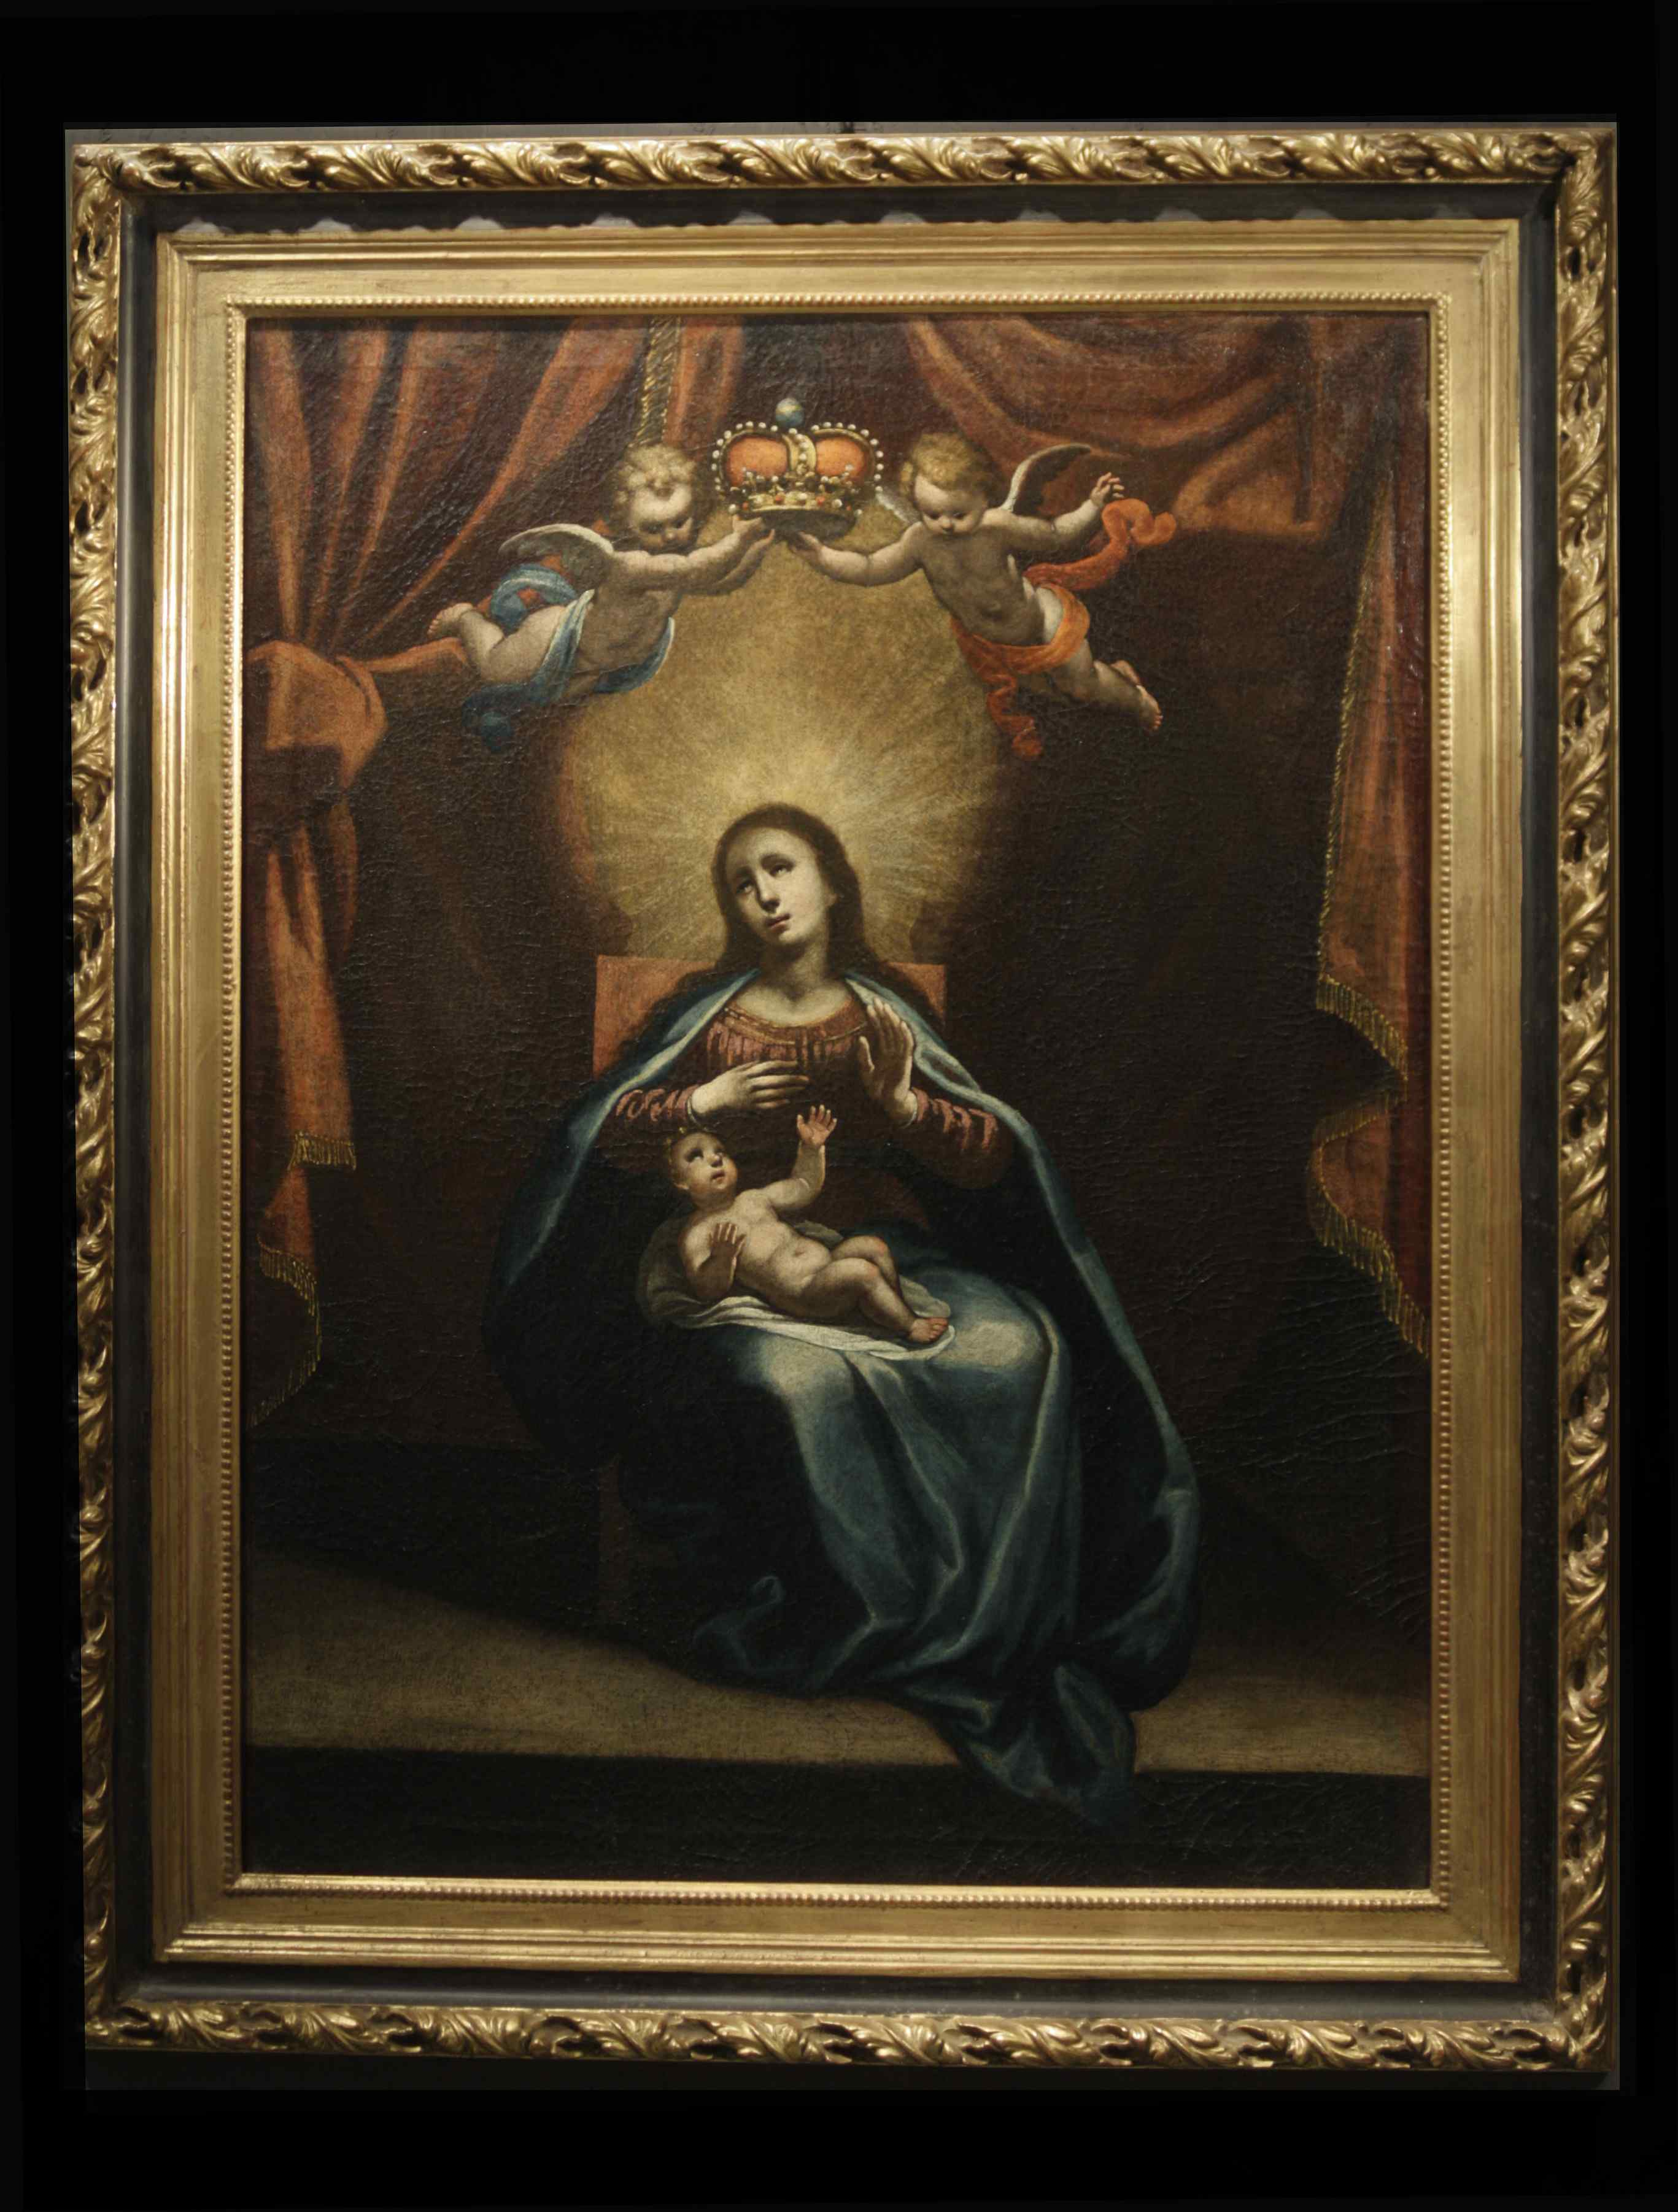 ASTOLFO PETRAZZI (SIENA 1580-1653) MADONNA  BAMBINO E ANGELI